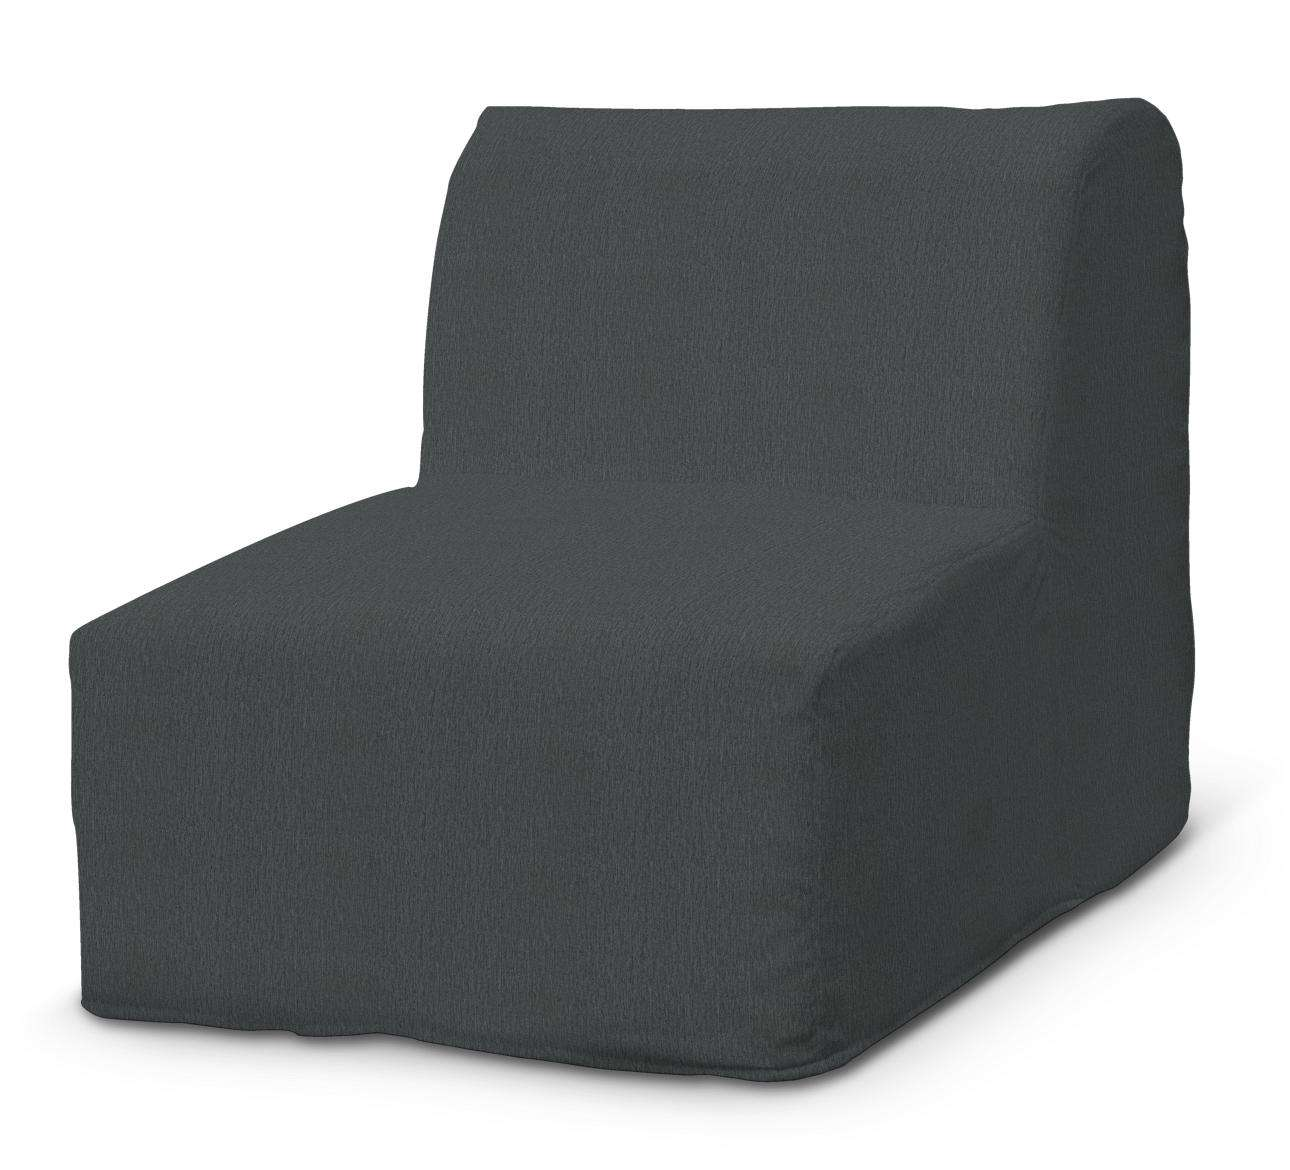 Pokrowiec na fotel Lycksele prosty fotel Lycksele w kolekcji Chenille, tkanina: 702-20